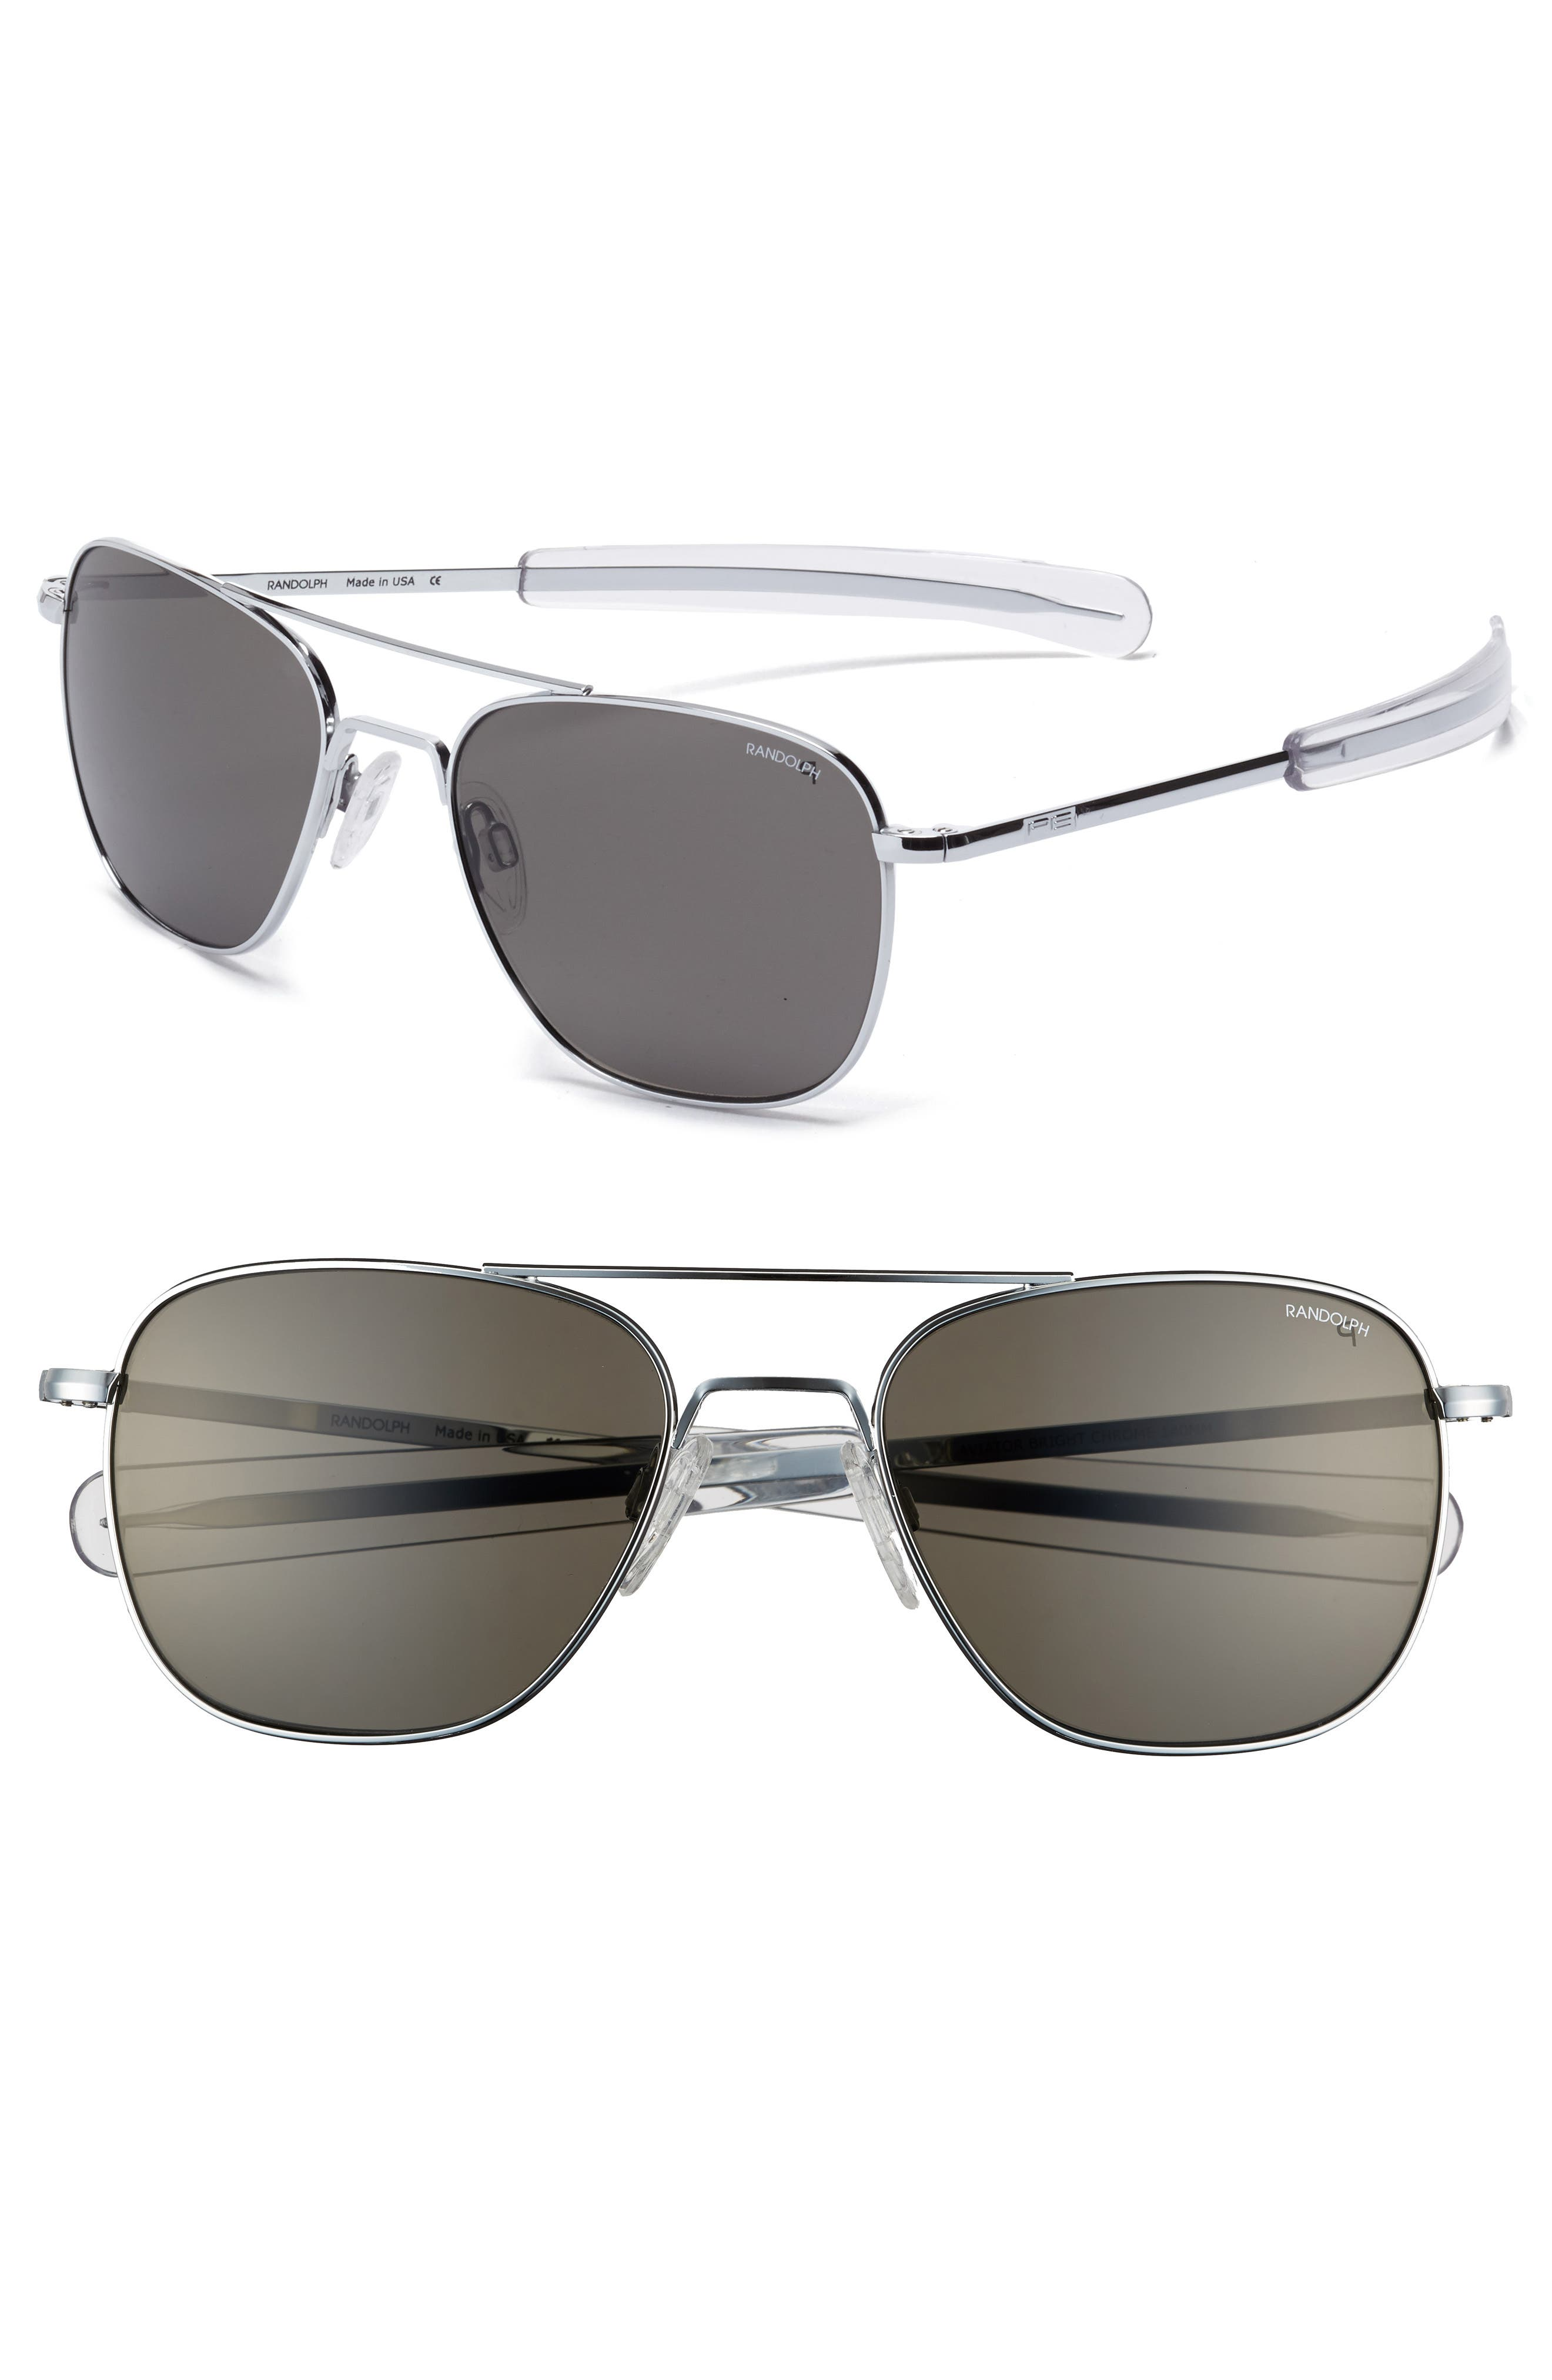 55mm Polarized Aviator Sunglasses,                             Alternate thumbnail 2, color,                             045